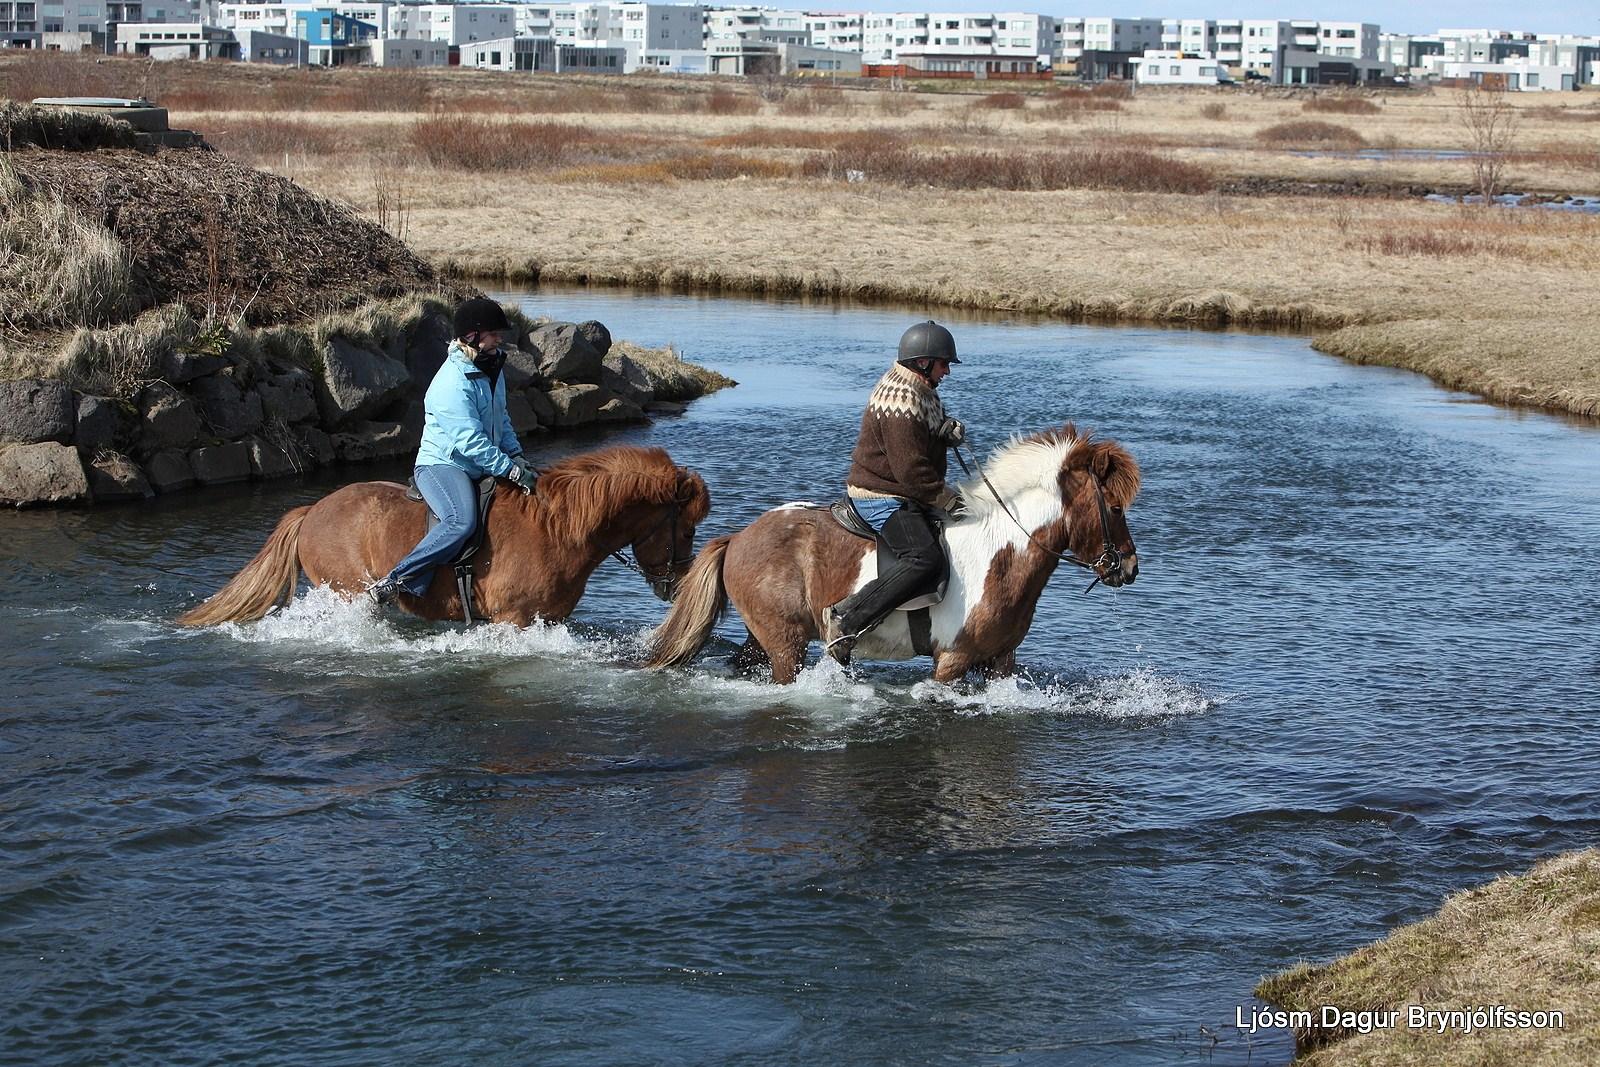 icelandic horses, islandpferde